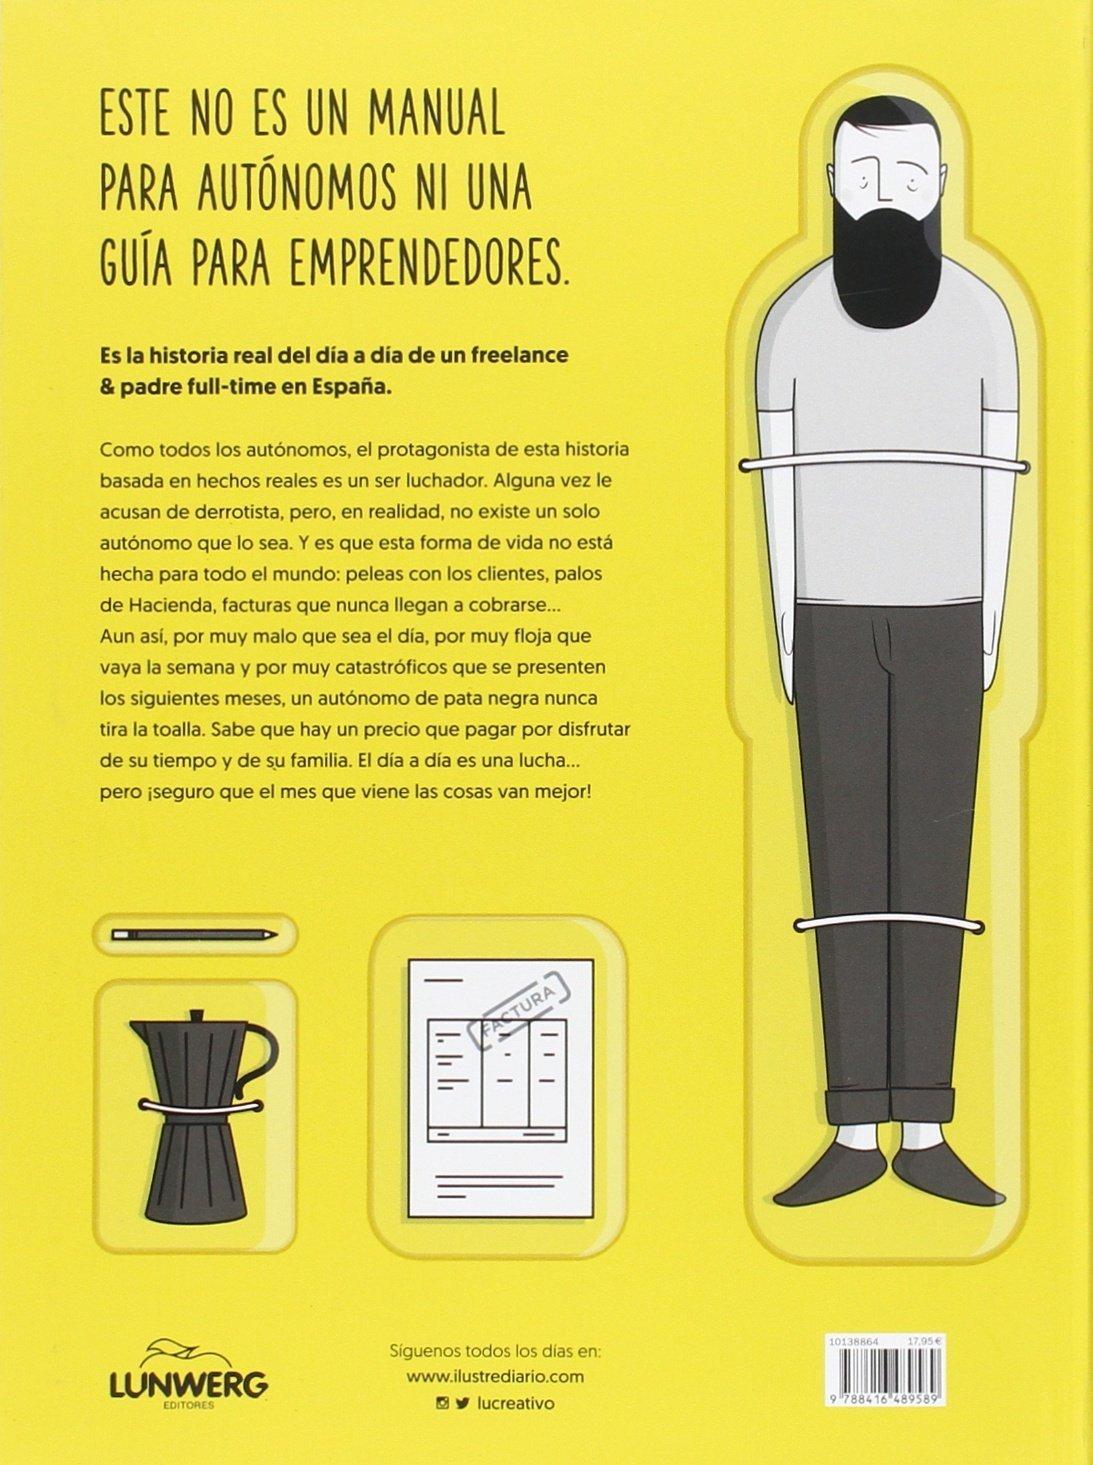 Almanaque ilustrado de un freelance & padre full-time Ilustración: Amazon.es: Lucreativo: Libros